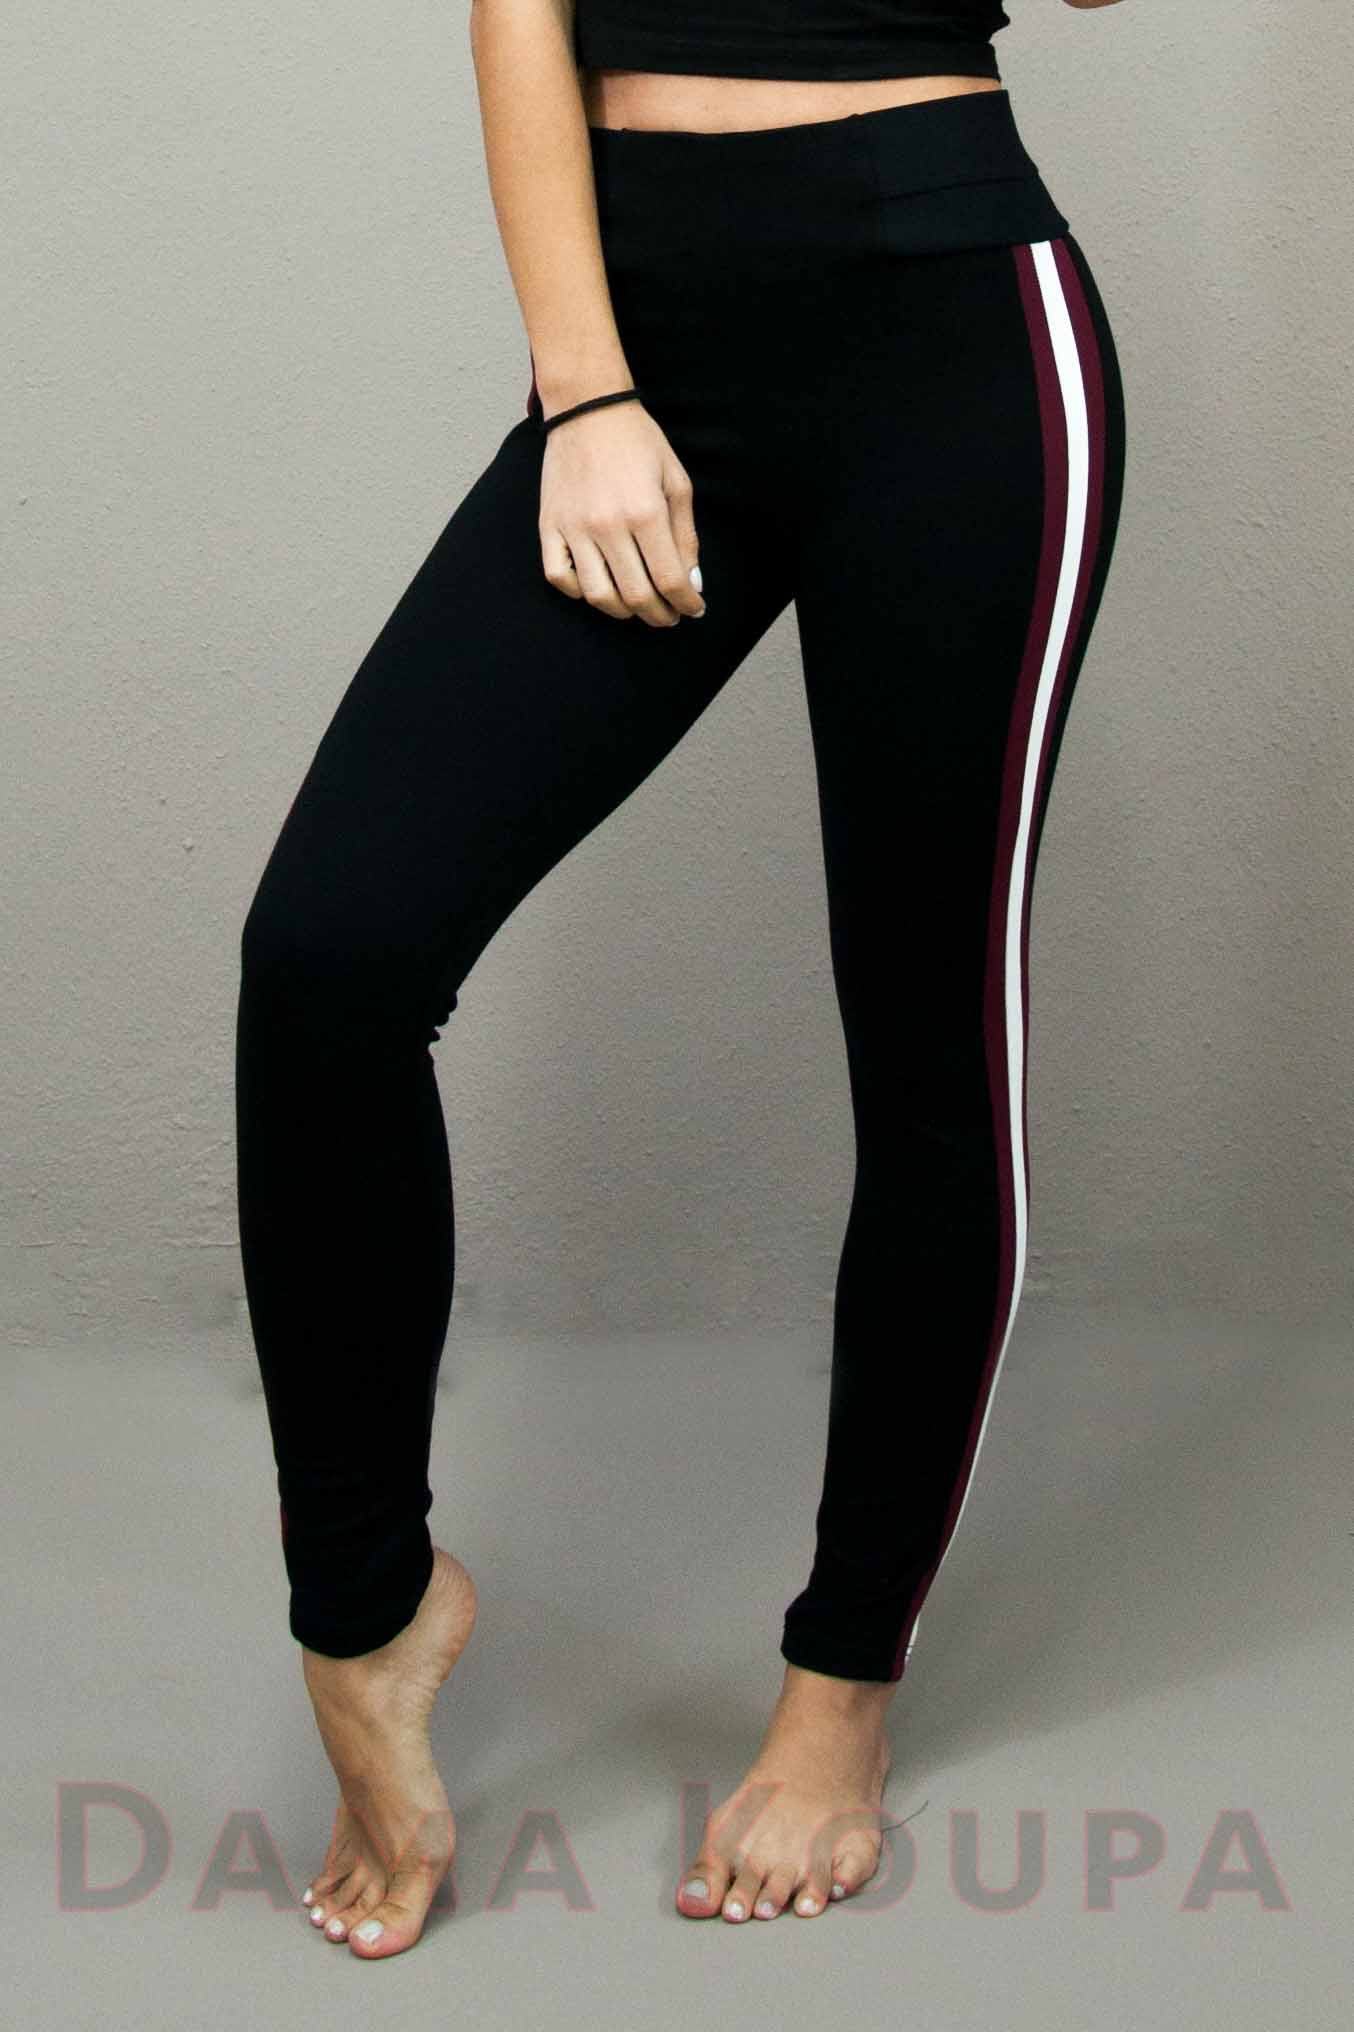 0f75aabe0eb8 Παντελόνι με ρίγες Παντελόνι με ρίγα στο πλάι Παντελόνι μαύρο ...